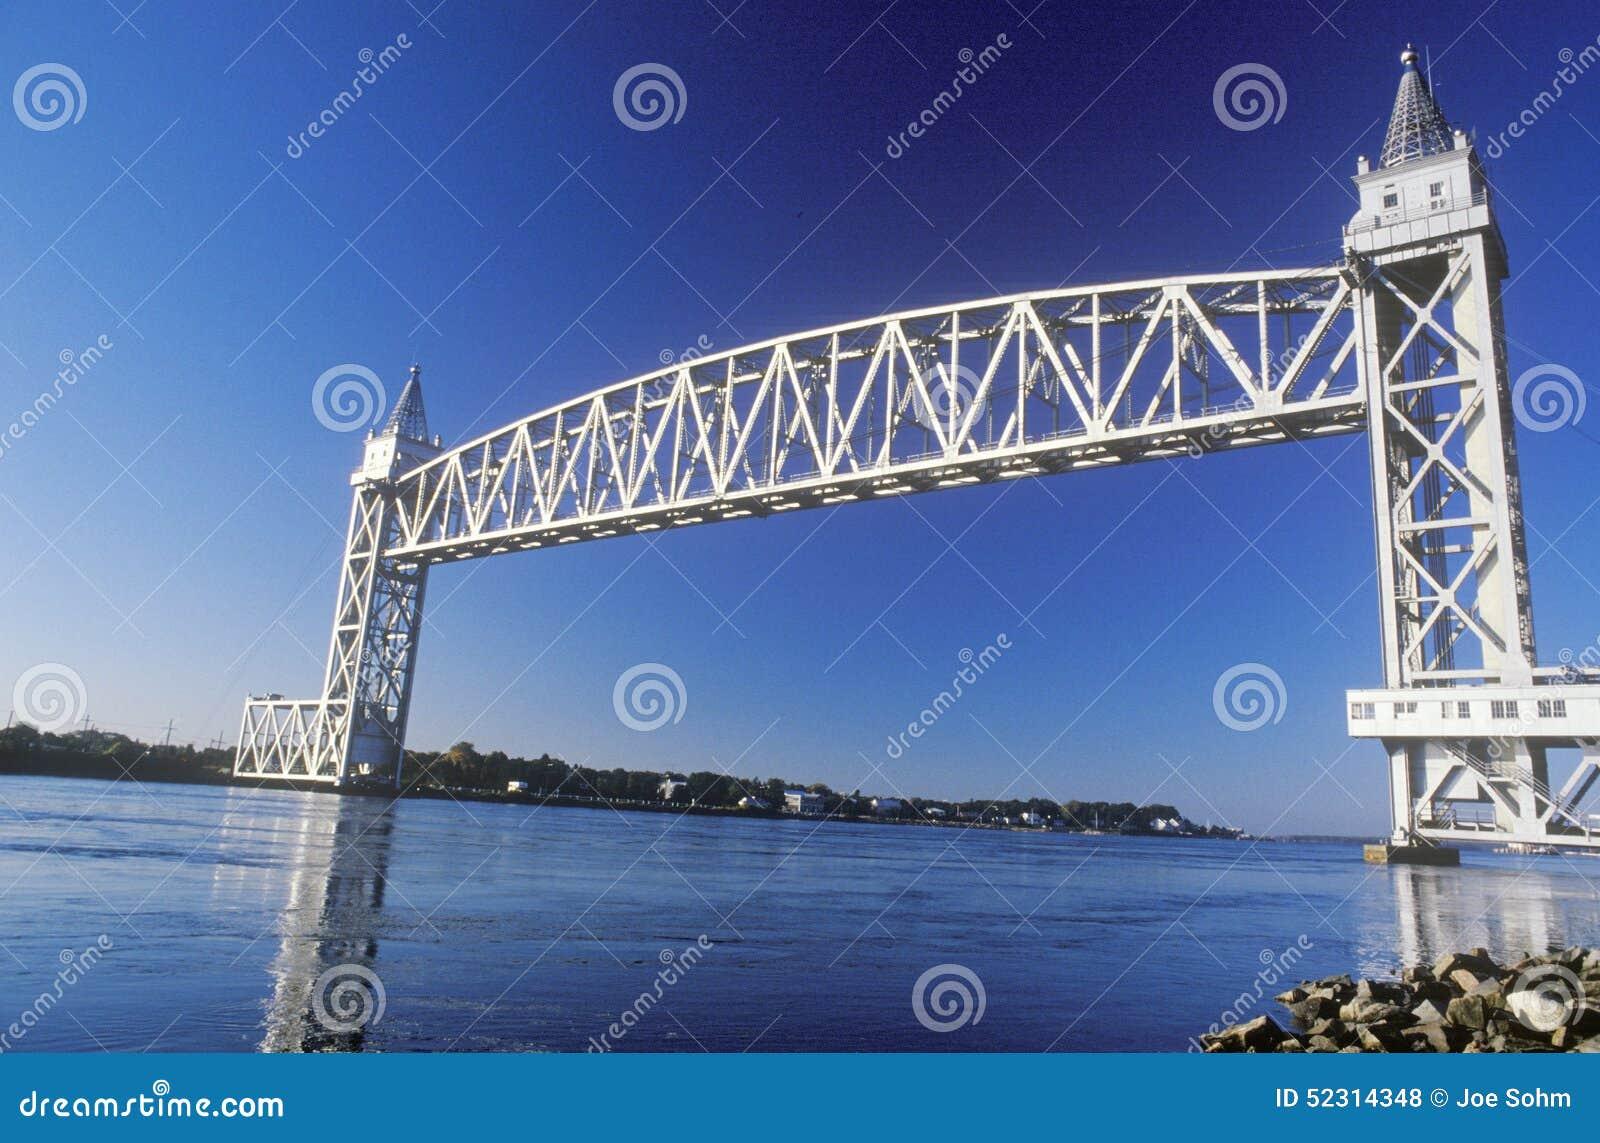 Railroad Lift Bridge Royalty Free Stock Photo